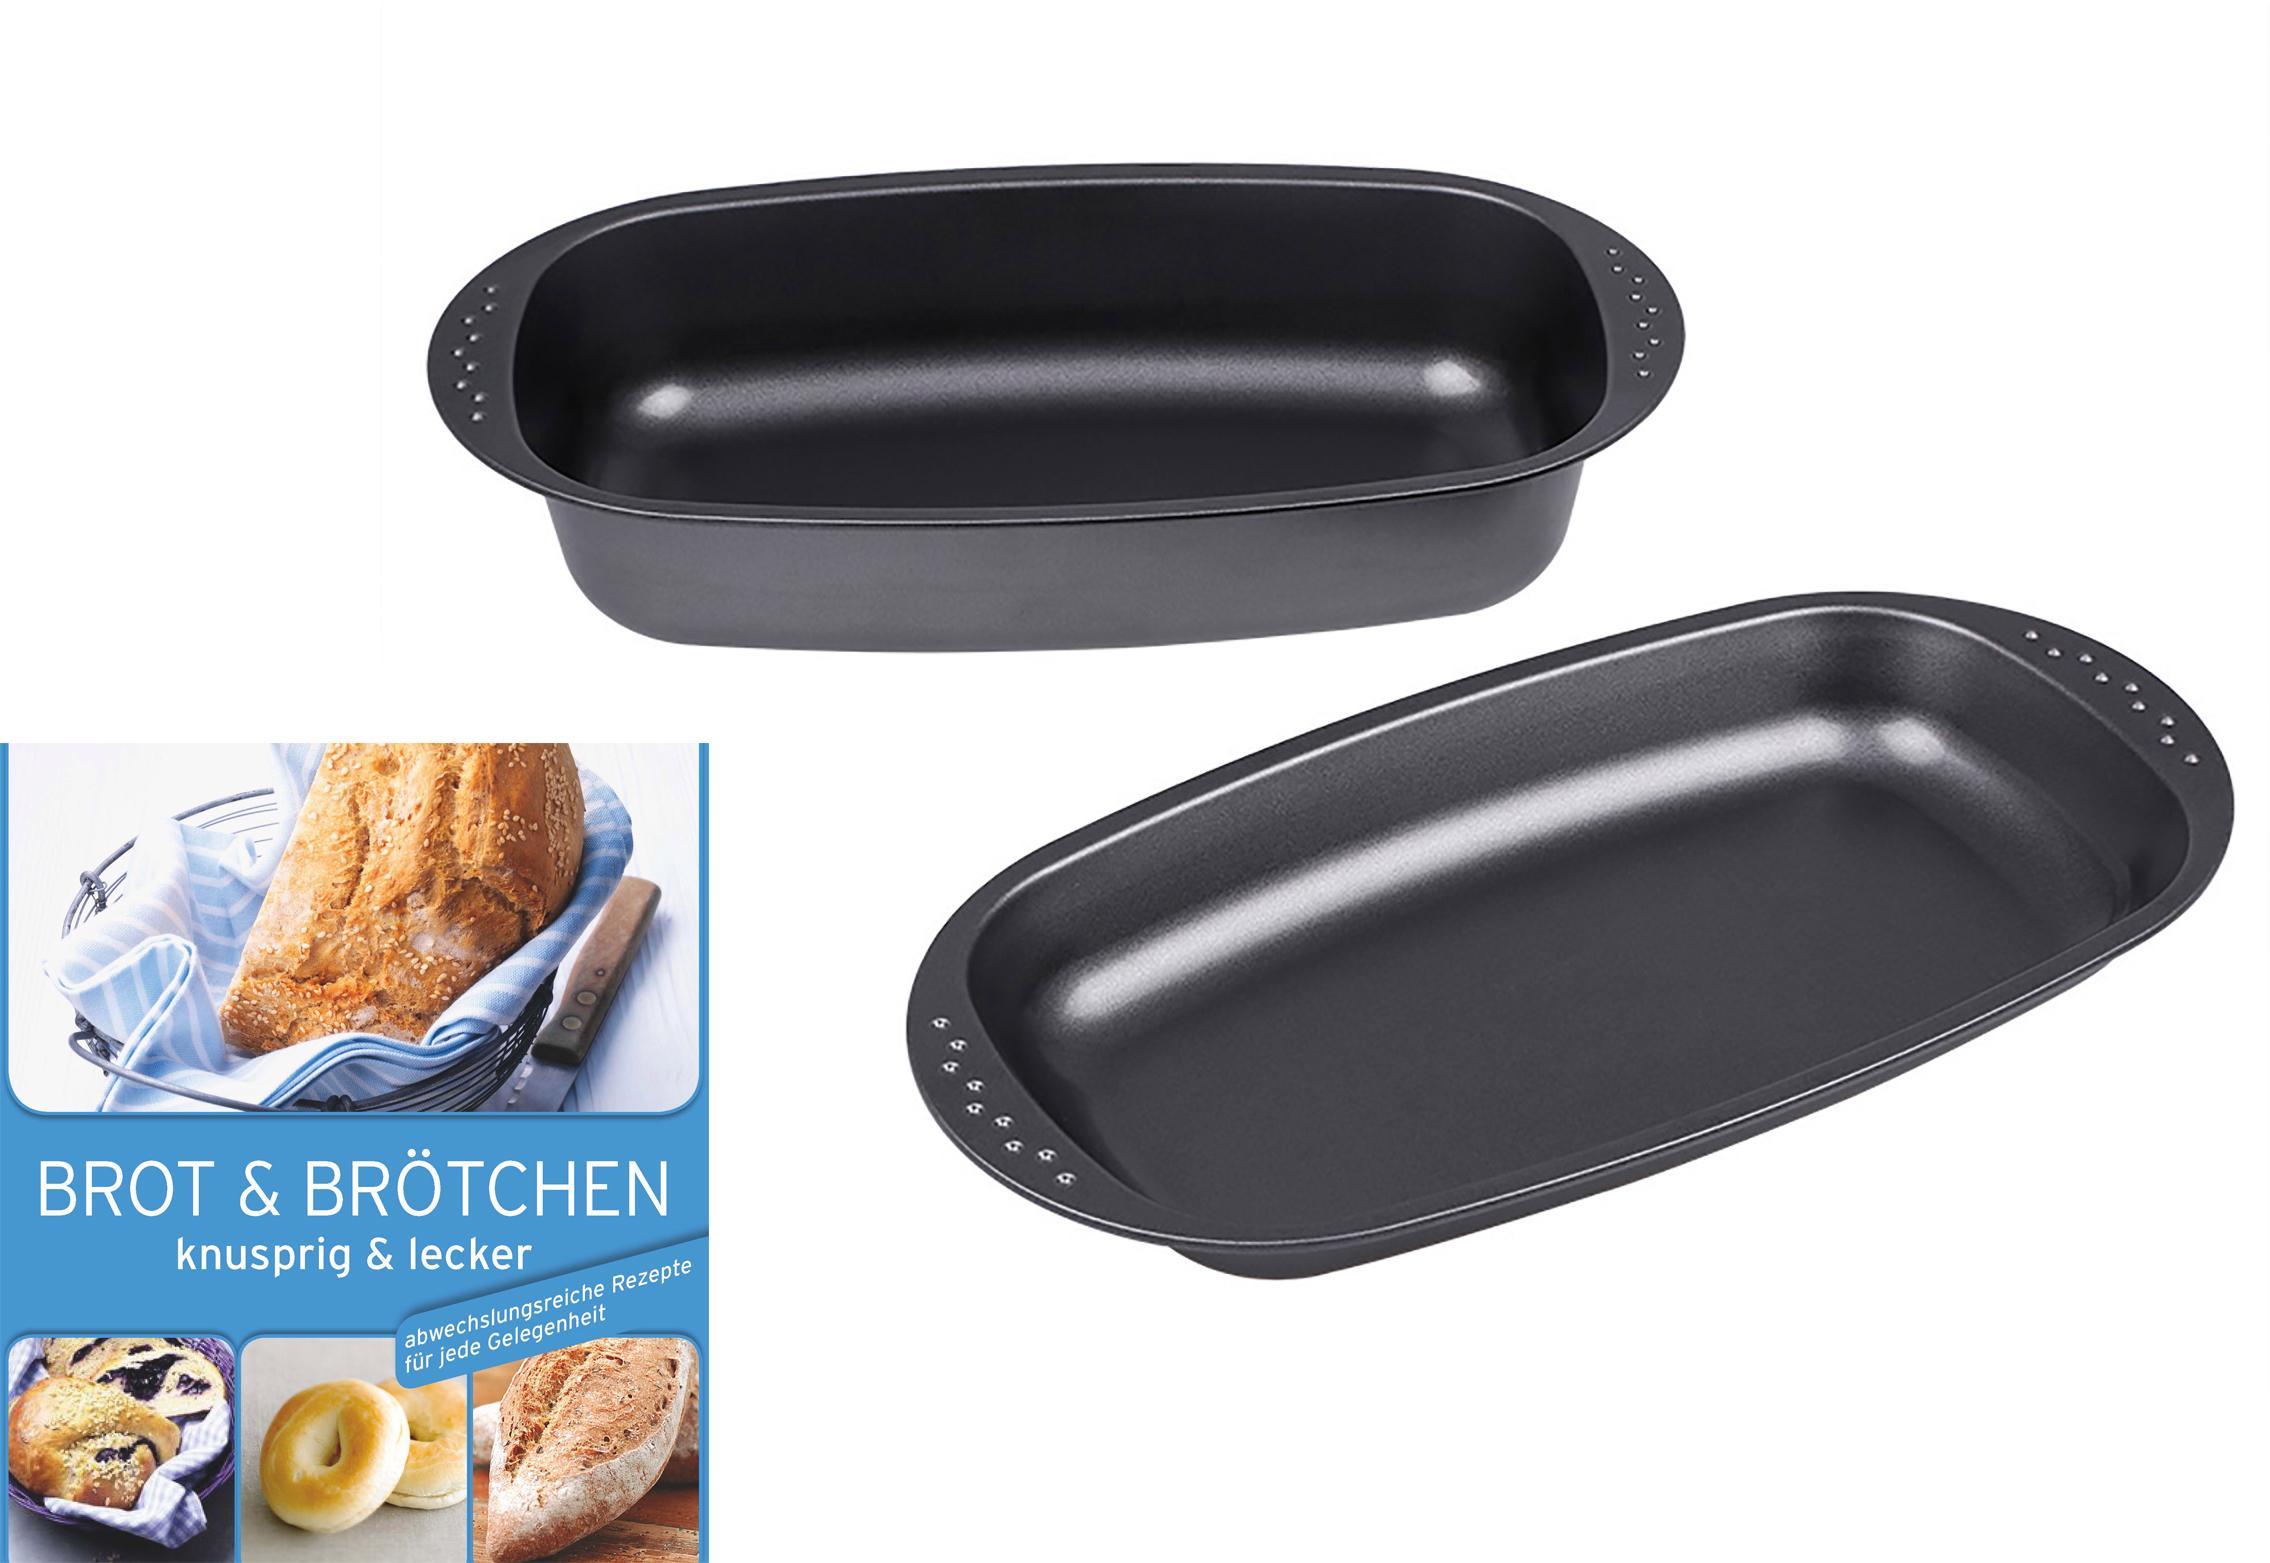 CHG Brotbackform, (Set), Stahlblech, mit Deckel, Inkl. Backbuch schwarz Brotbackform Backformen Backbleche Kochen Backen Haushaltswaren